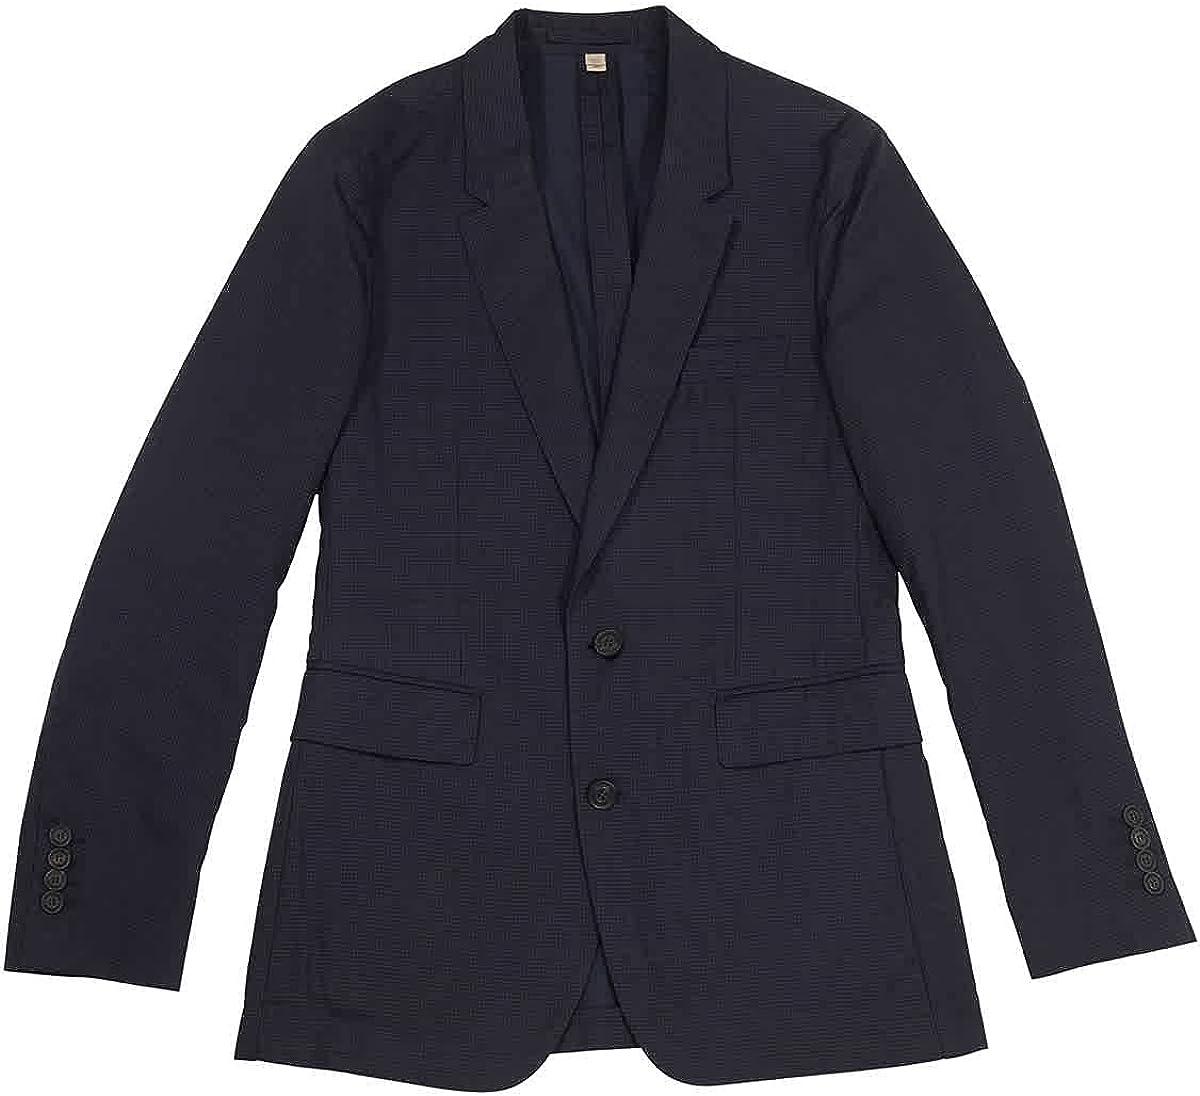 BURBERRY Serpentine Navy Gingham Print Sport Coat, Brand Size 46R (US Size 36)